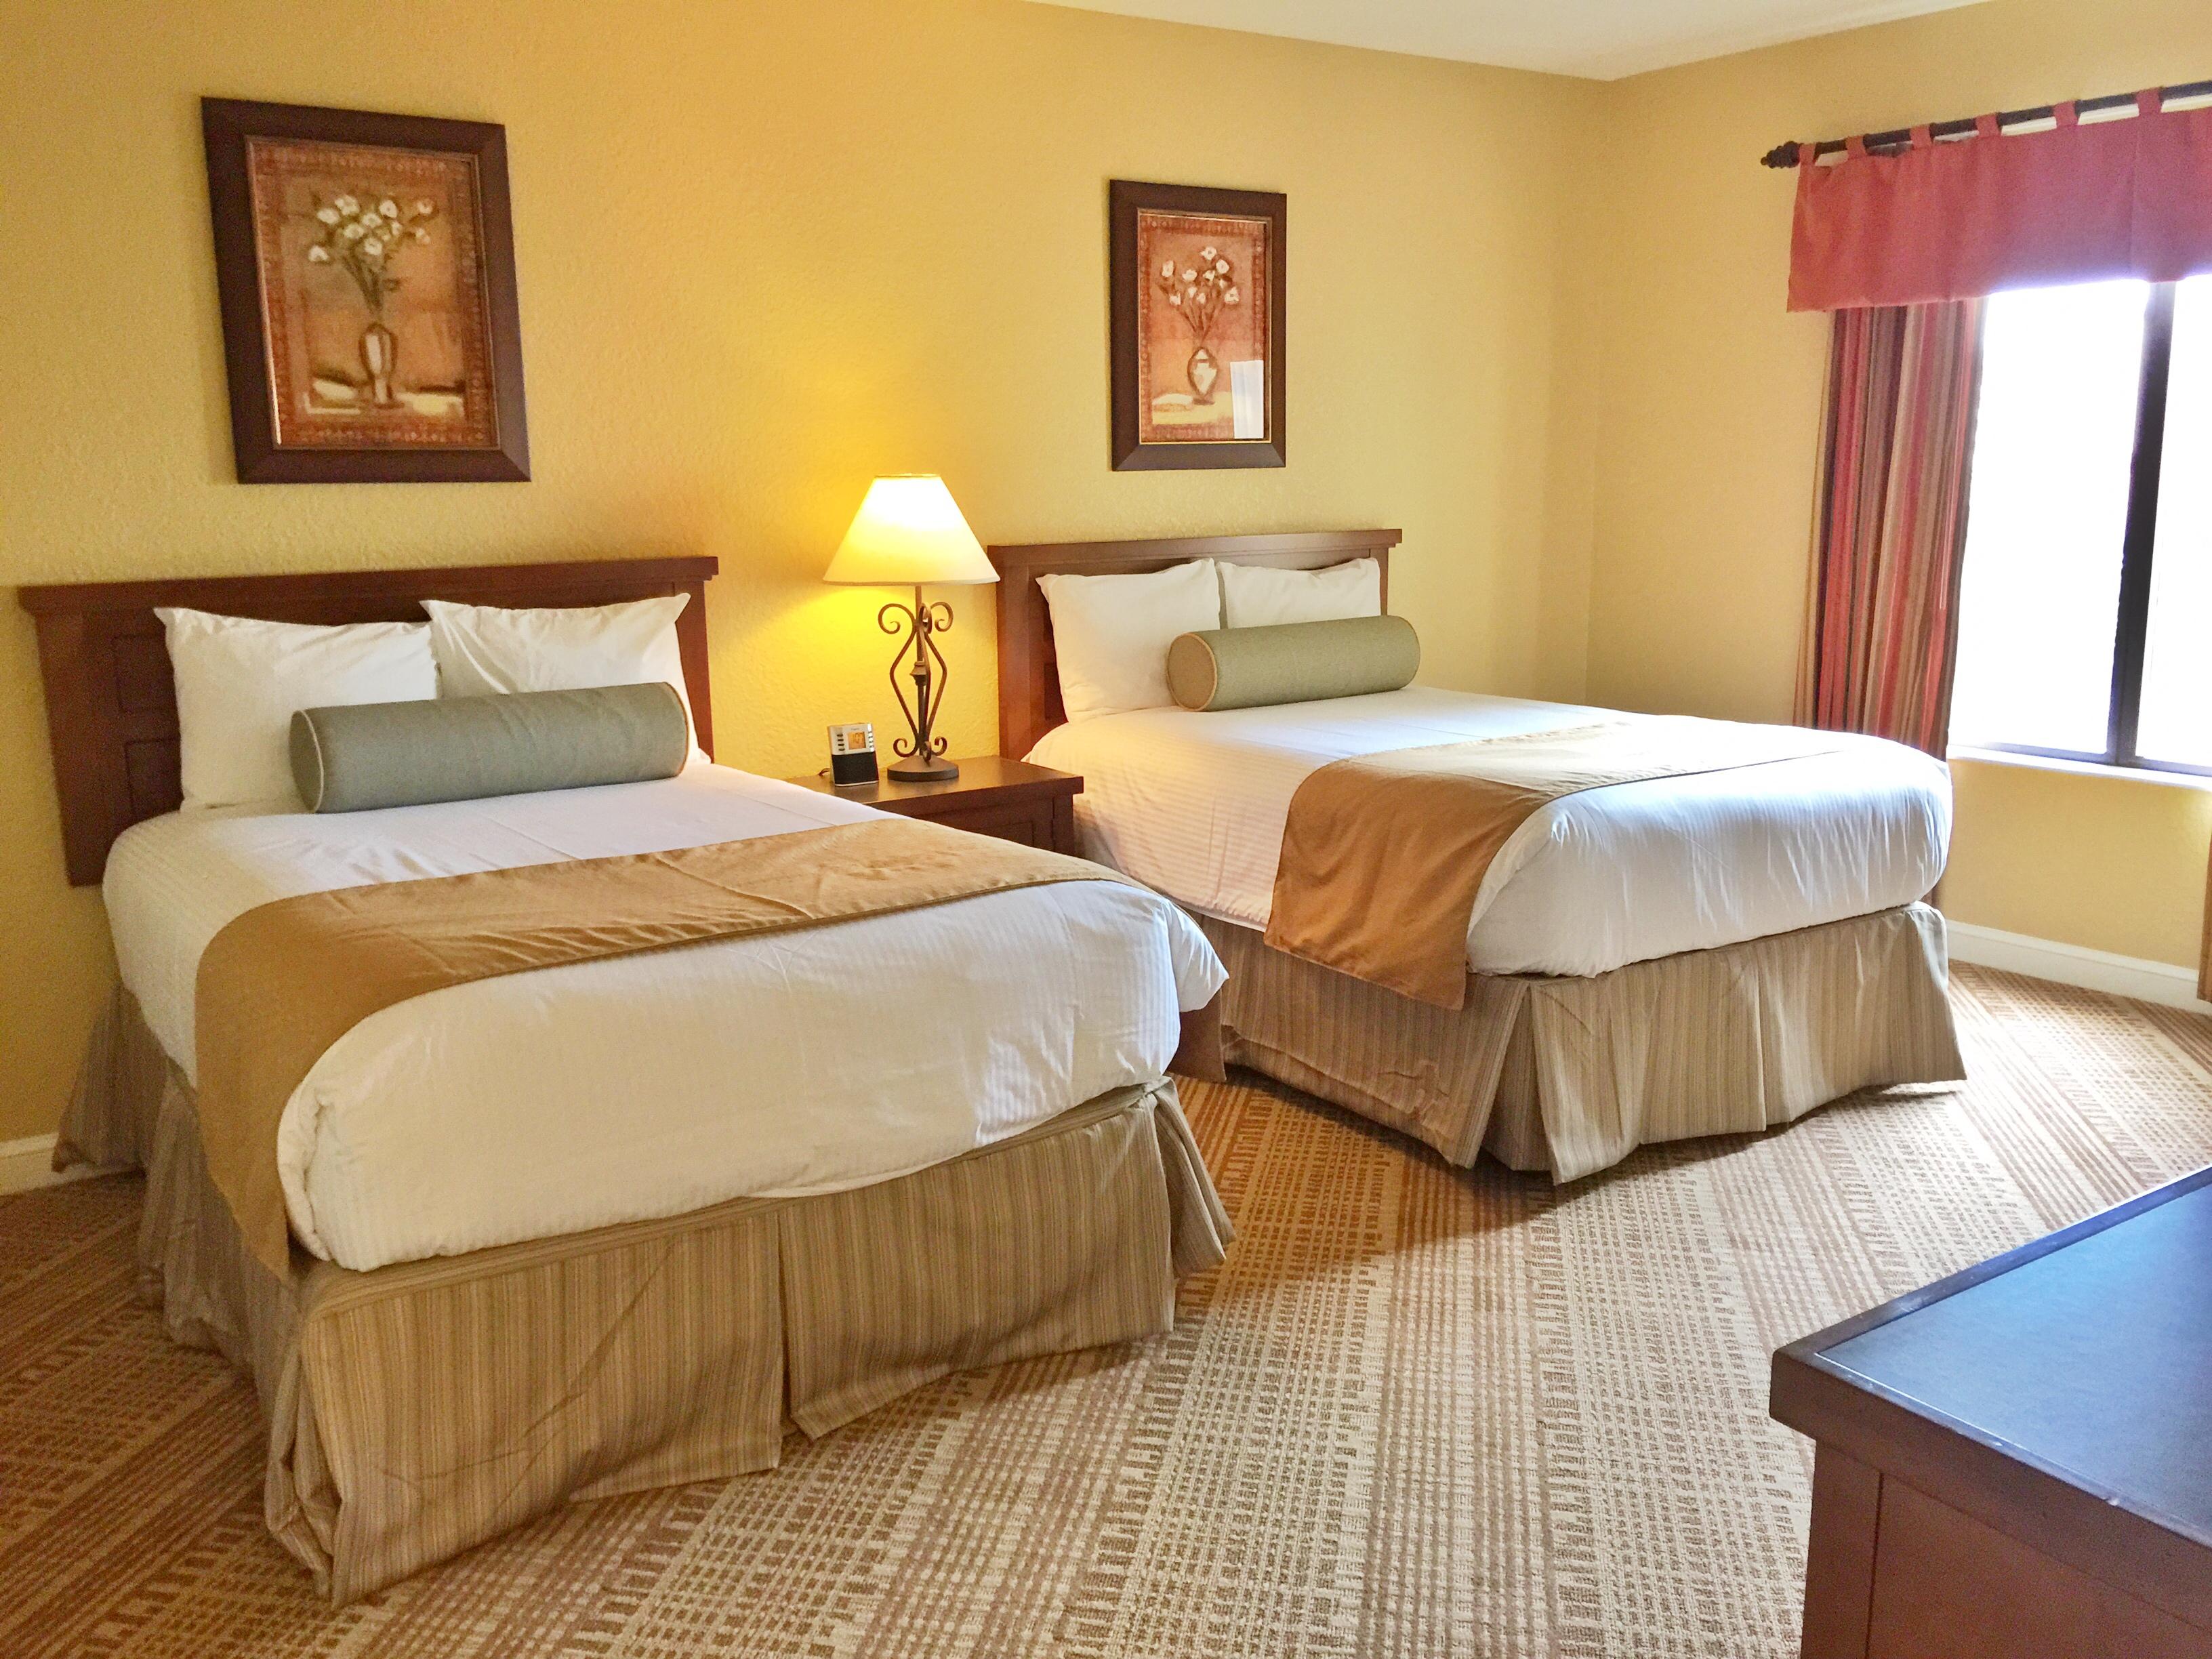 Apartment Bonnet Creek Orlando 3 Bedroom 2 Bath photo 16825331